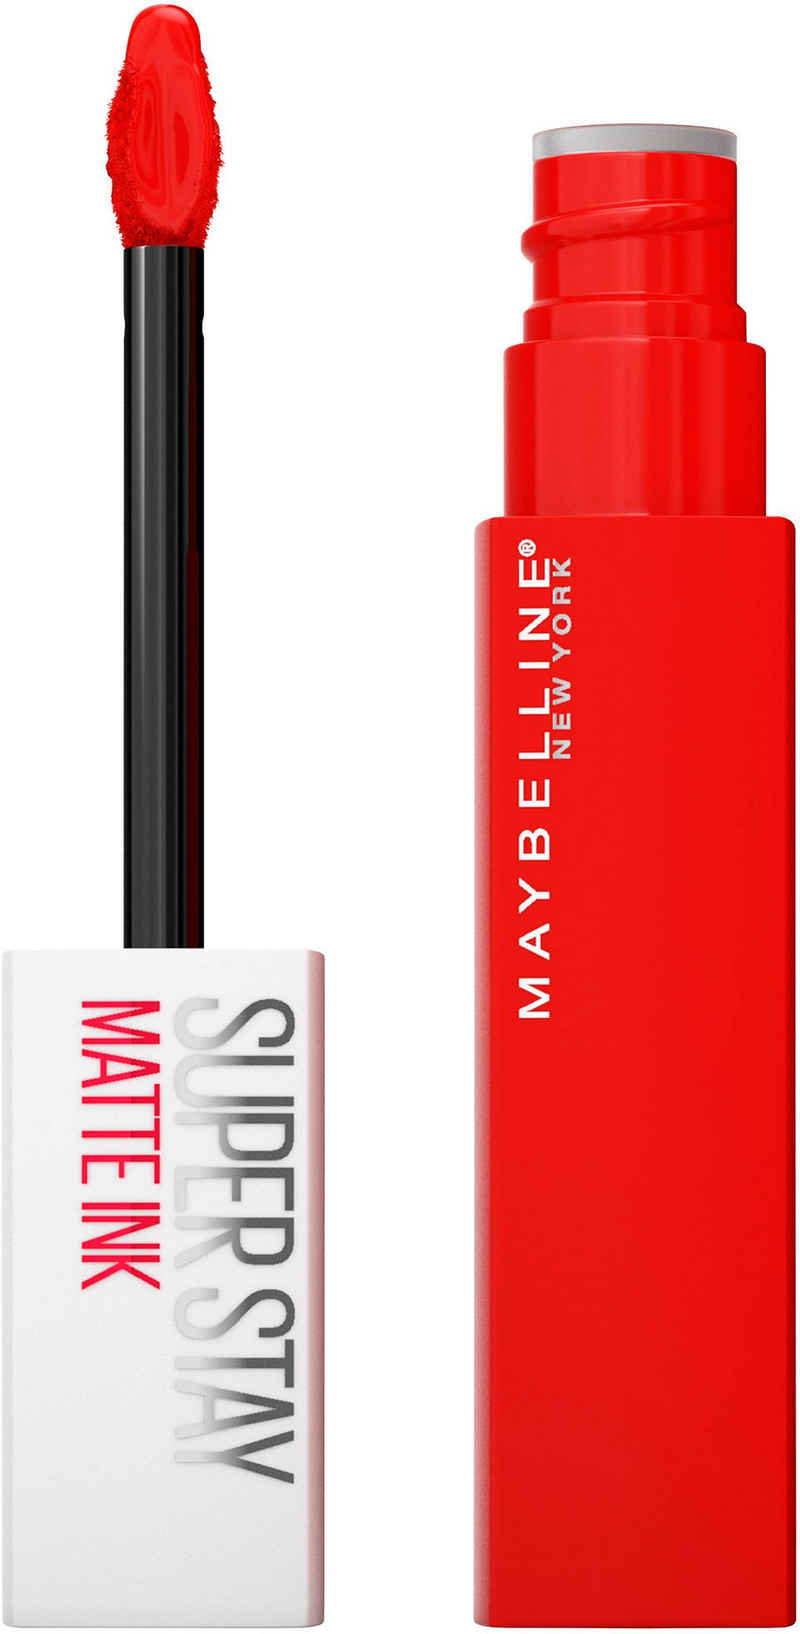 MAYBELLINE NEW YORK Lippenstift »Super Stay Matte Ink Spiced Up«